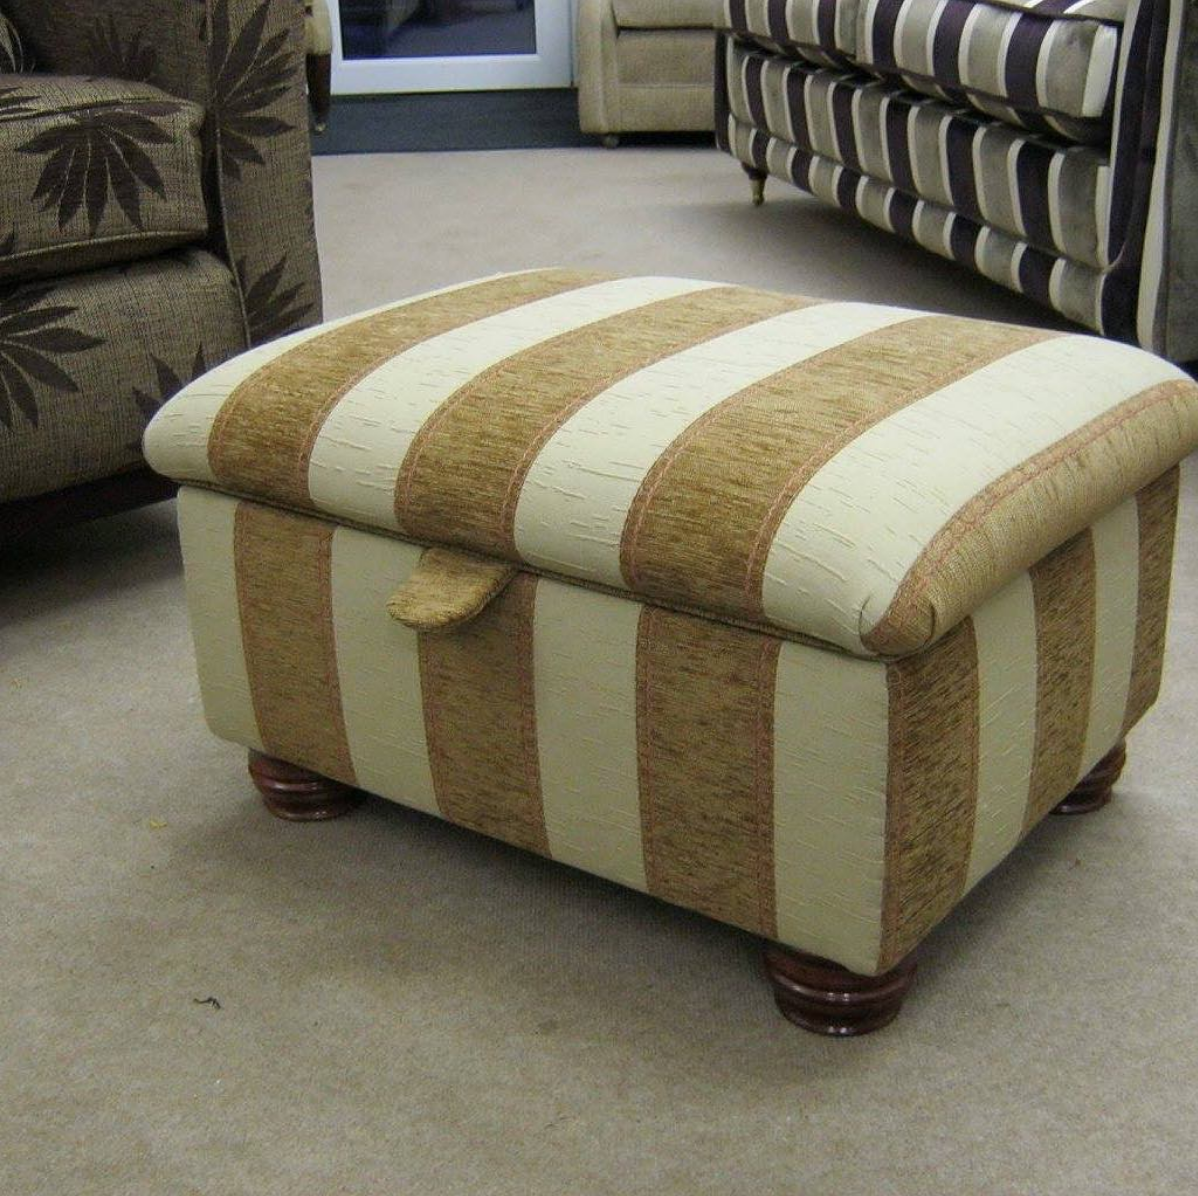 Bespoke Oak Tree footstool with lid closed